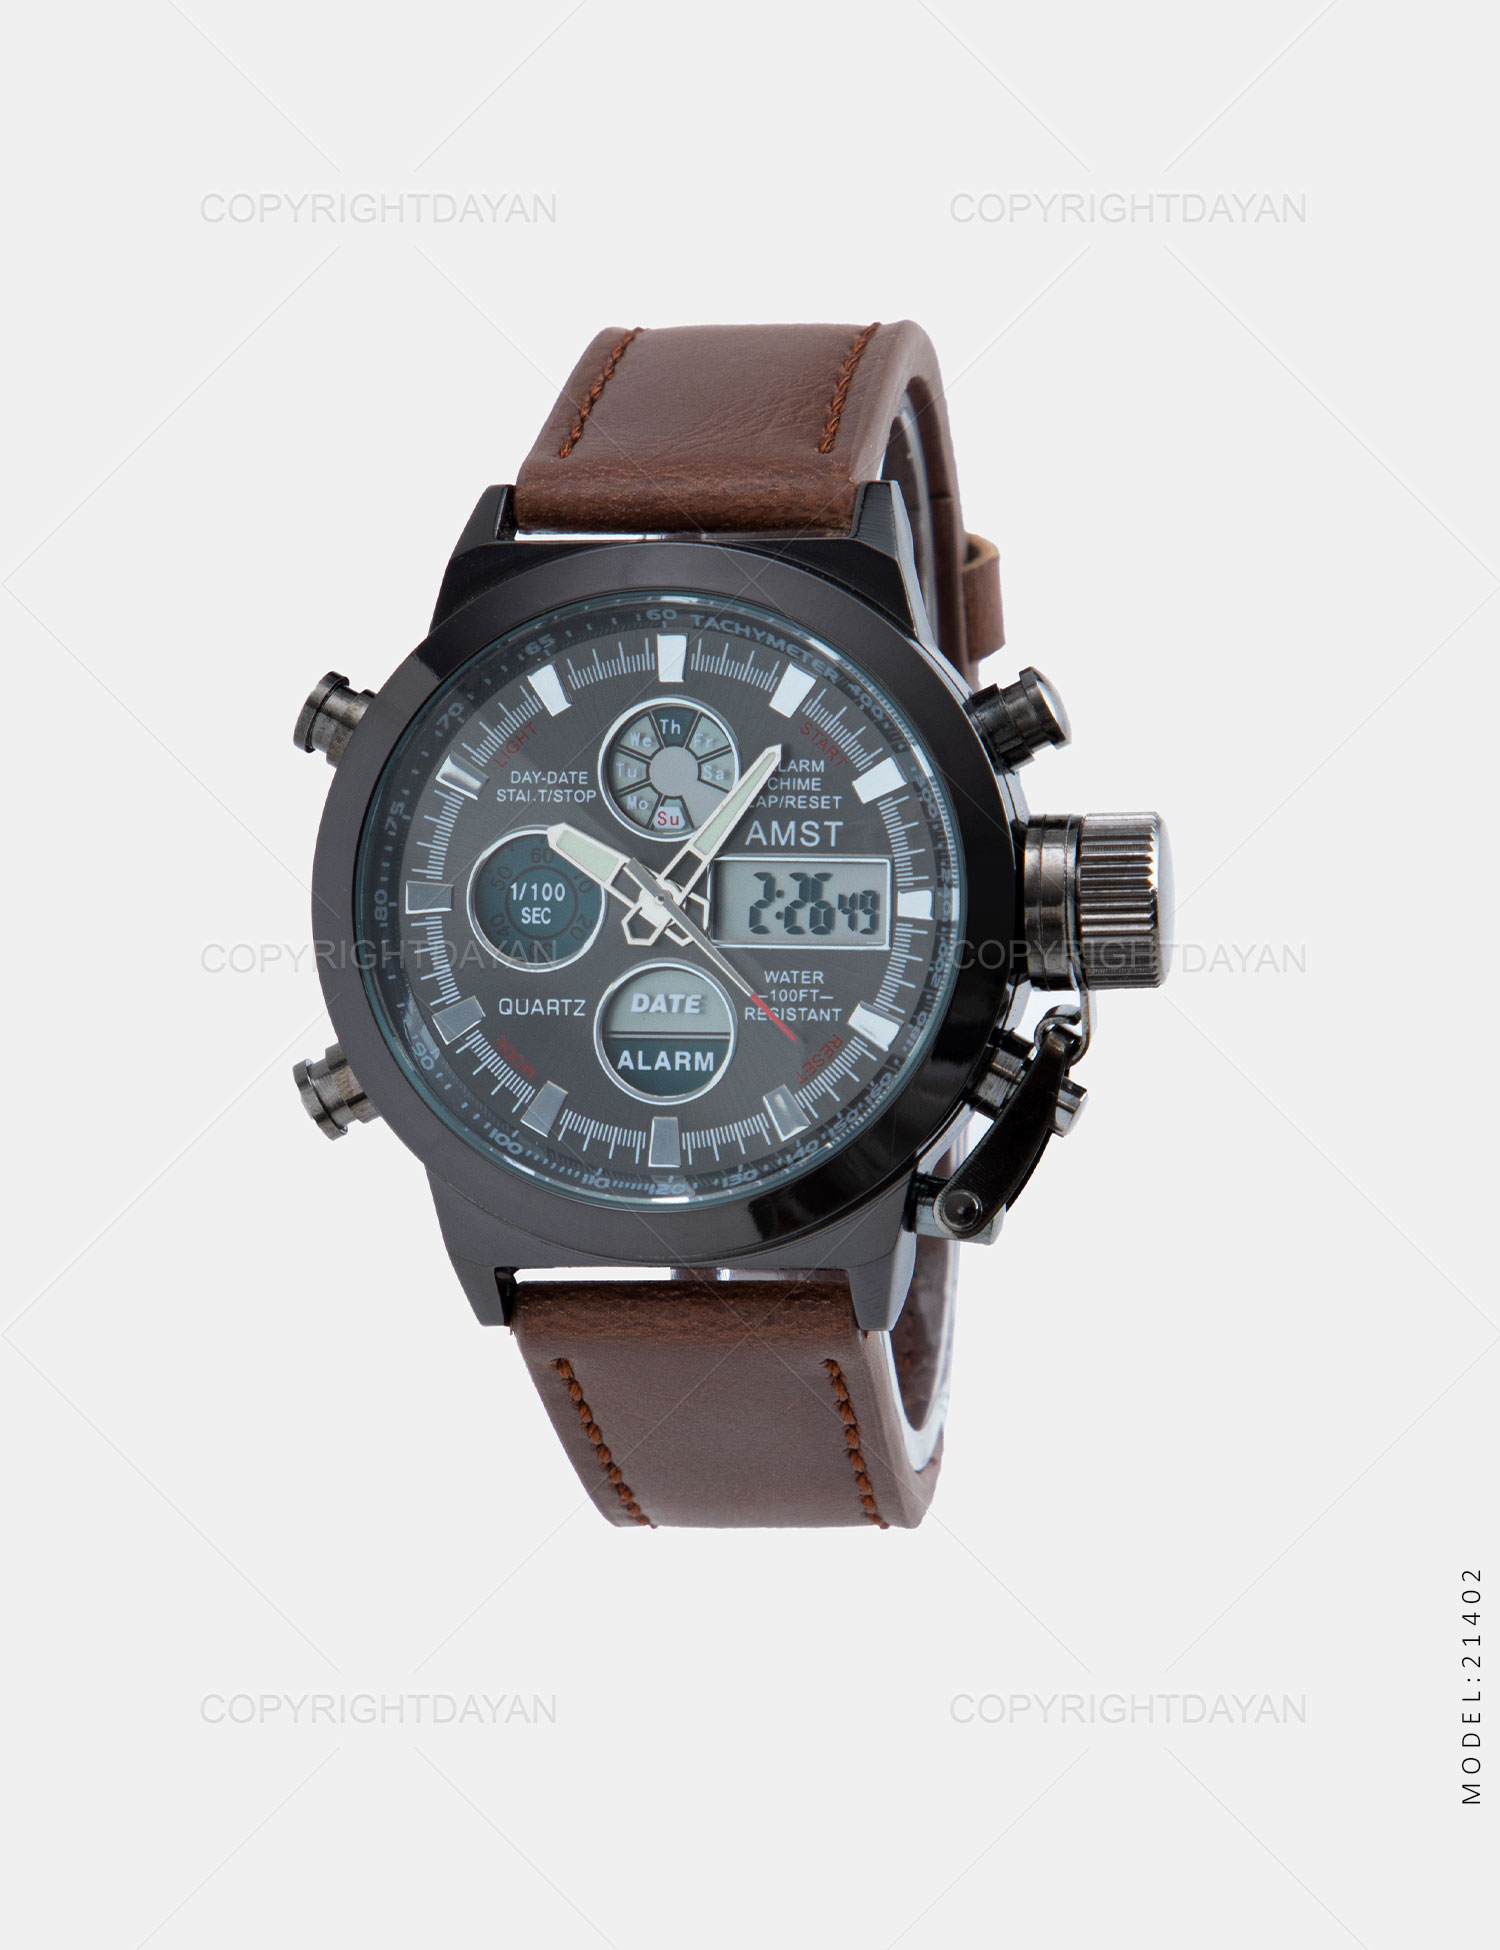 ساعت مچی مردانه AMST مدل 21402